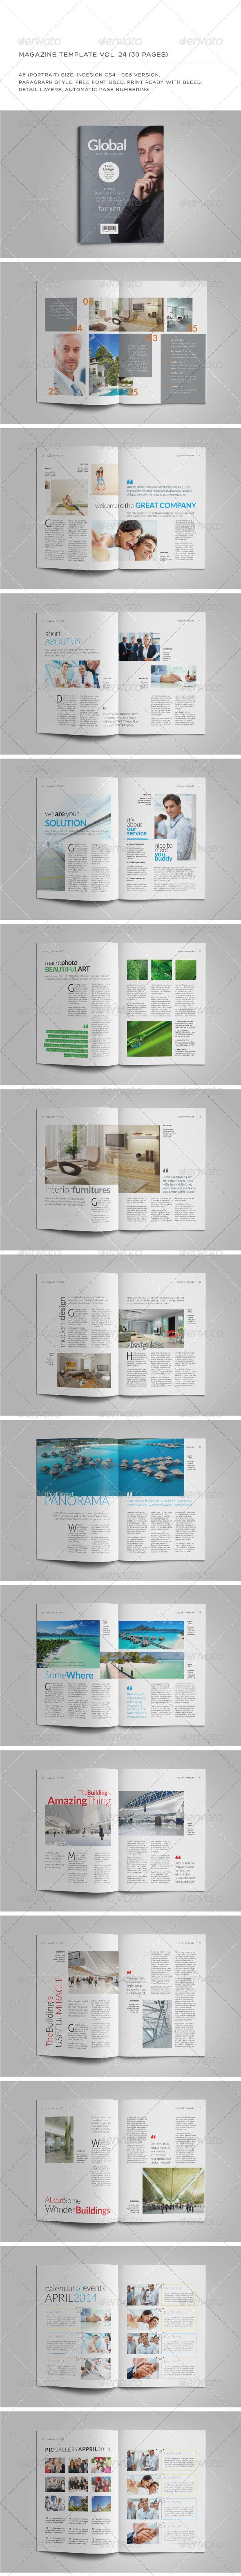 A5 Portrait 30 Pages MGZ (Vol. 24) - Magazines Print Templates